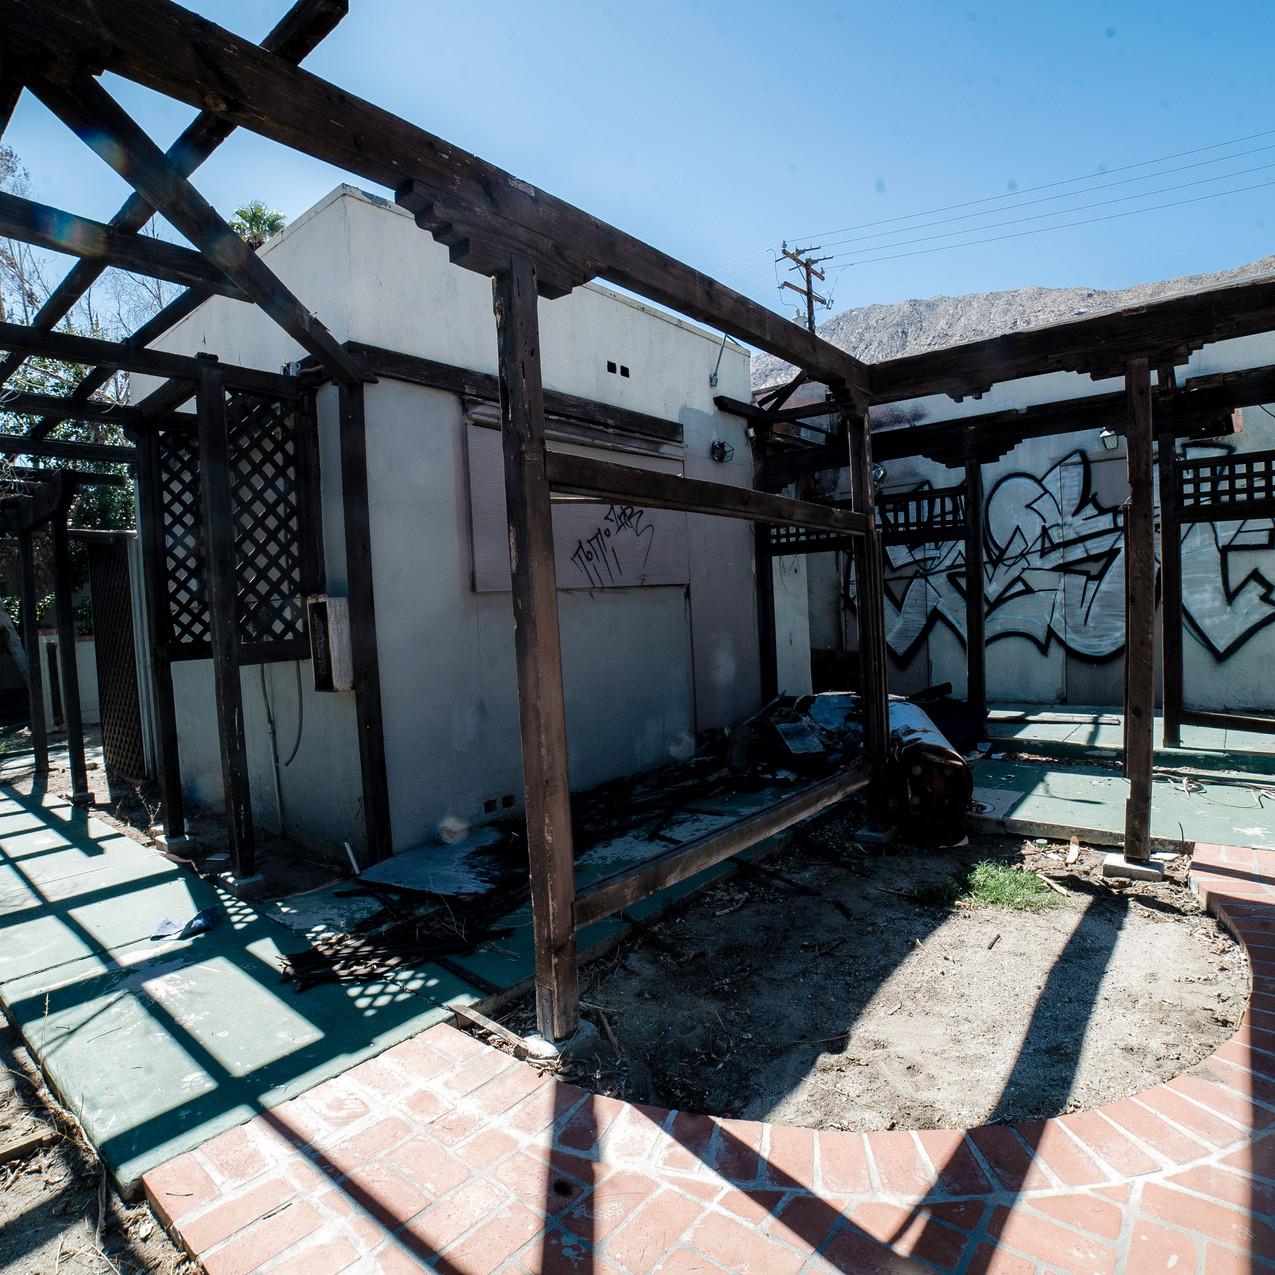 2017-09-27 Abandoned Orchard Tree Inn RAW-1